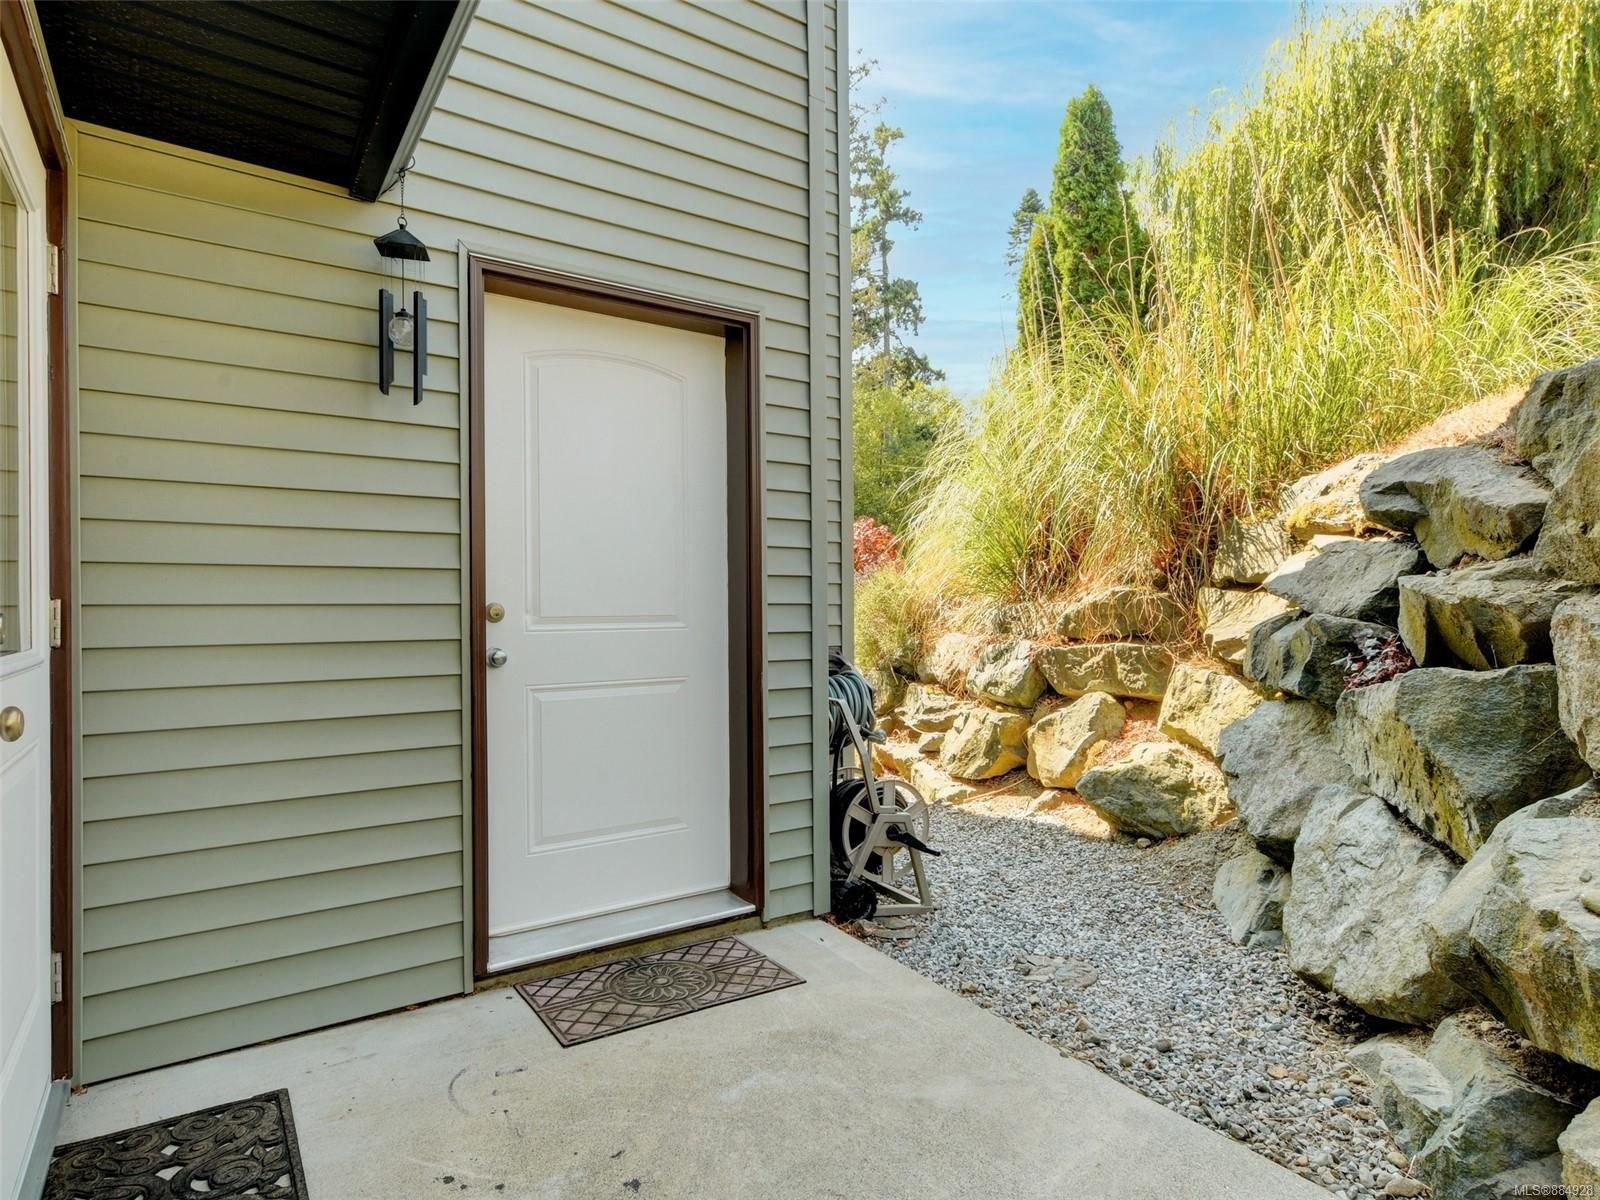 Photo 21: Photos: 6896 Beaton Rd in : Sk Broomhill Half Duplex for sale (Sooke)  : MLS®# 884928